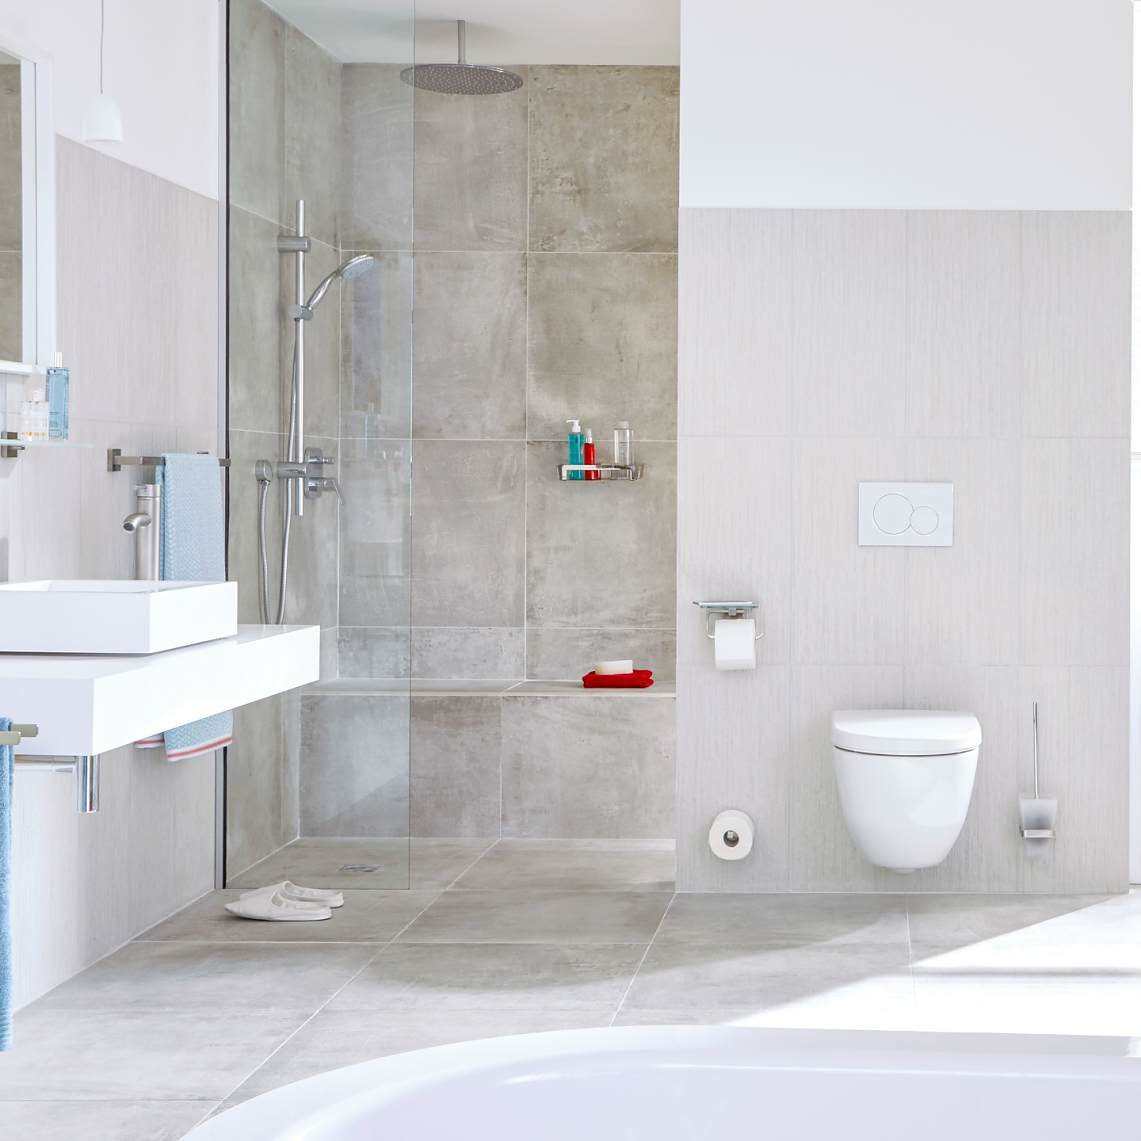 American Standard Bathroom Fittings Prices In Sri Lanka ...